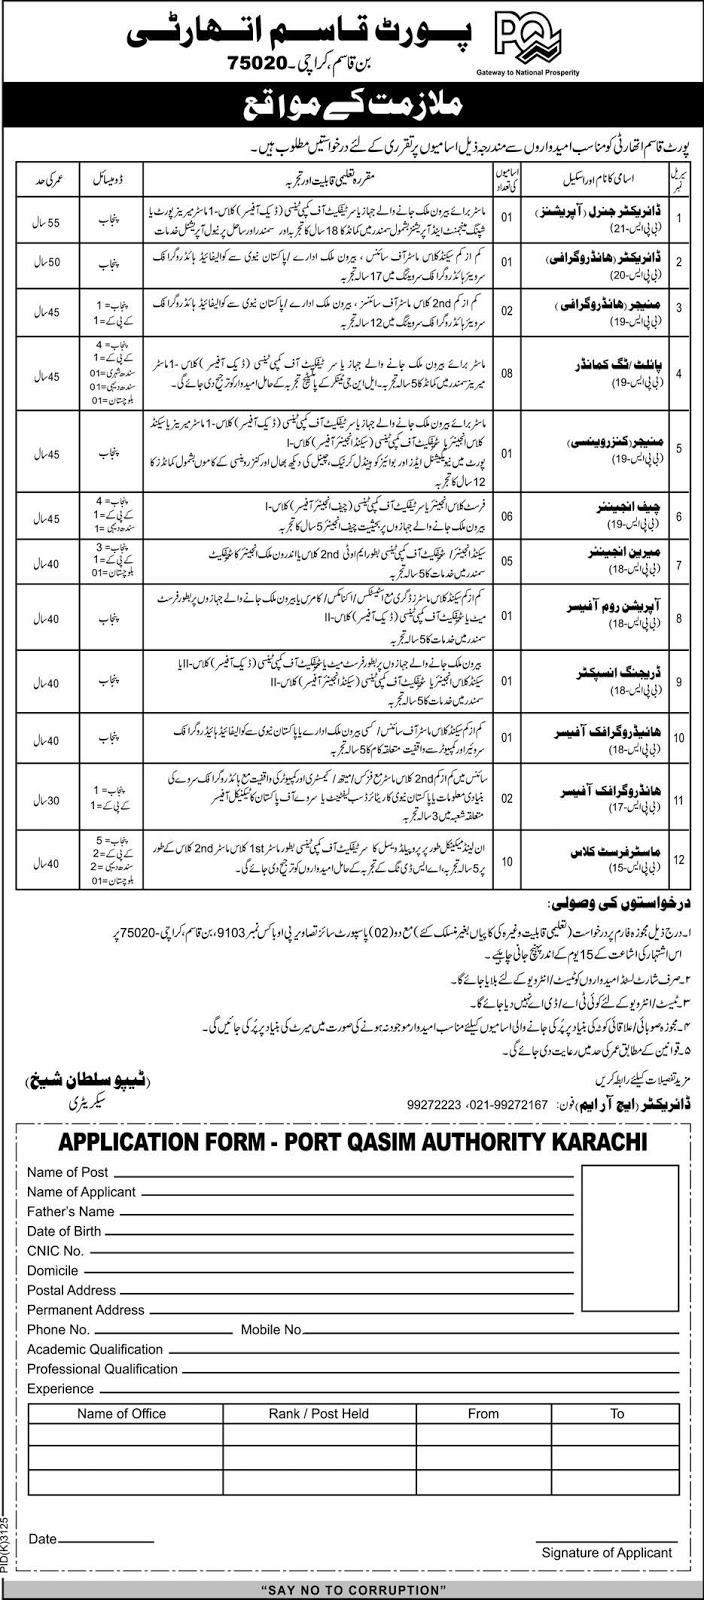 Port Qasim Authority Jobs Karachi Jobs Feb 2019  Vacancies 39